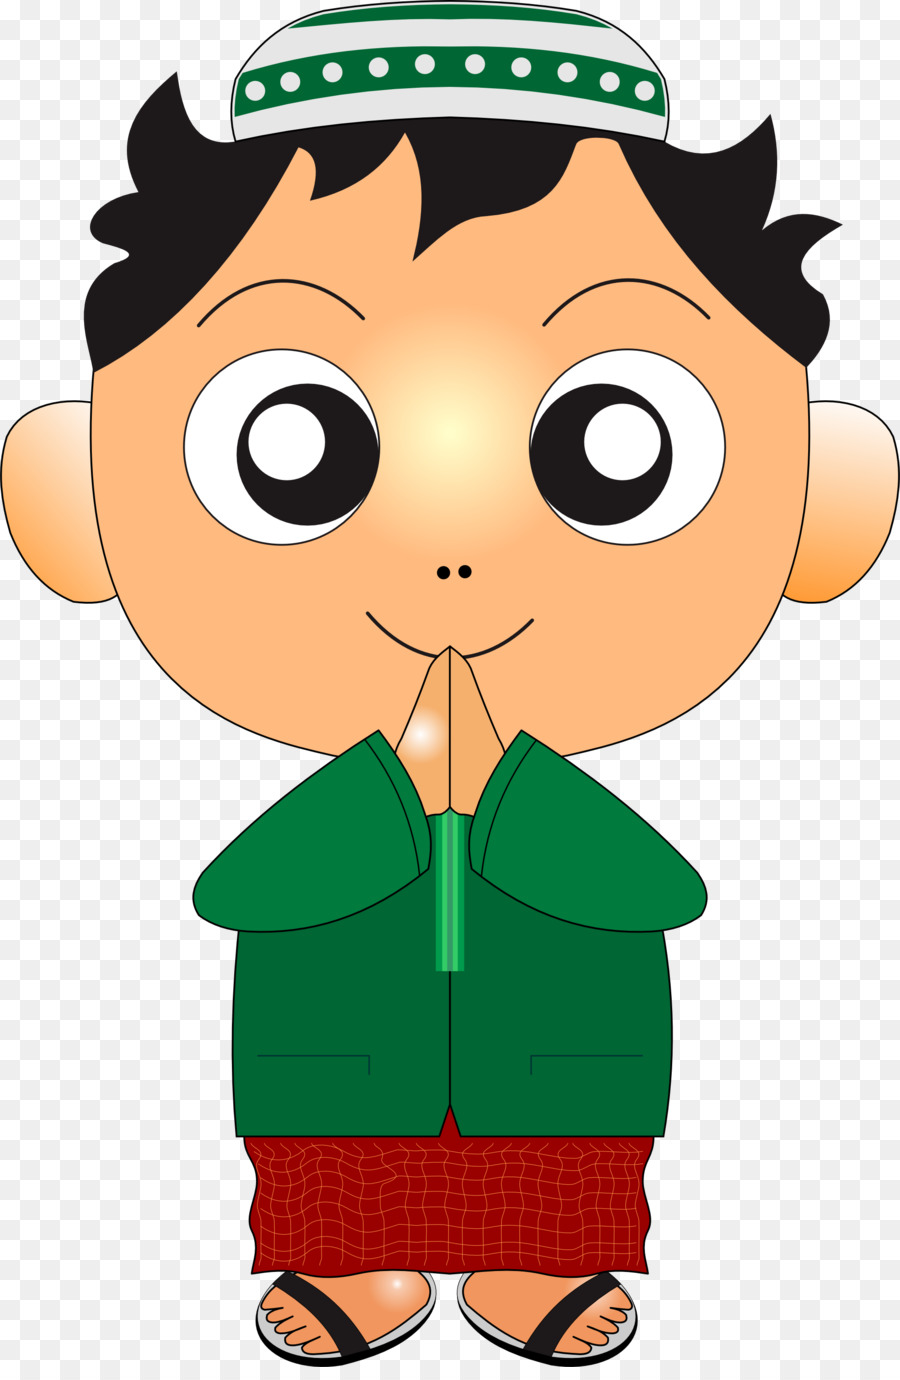 Boy Cartoon Png Download 1979 3005 Free Transparent Child Png Download Cleanpng Kisspng